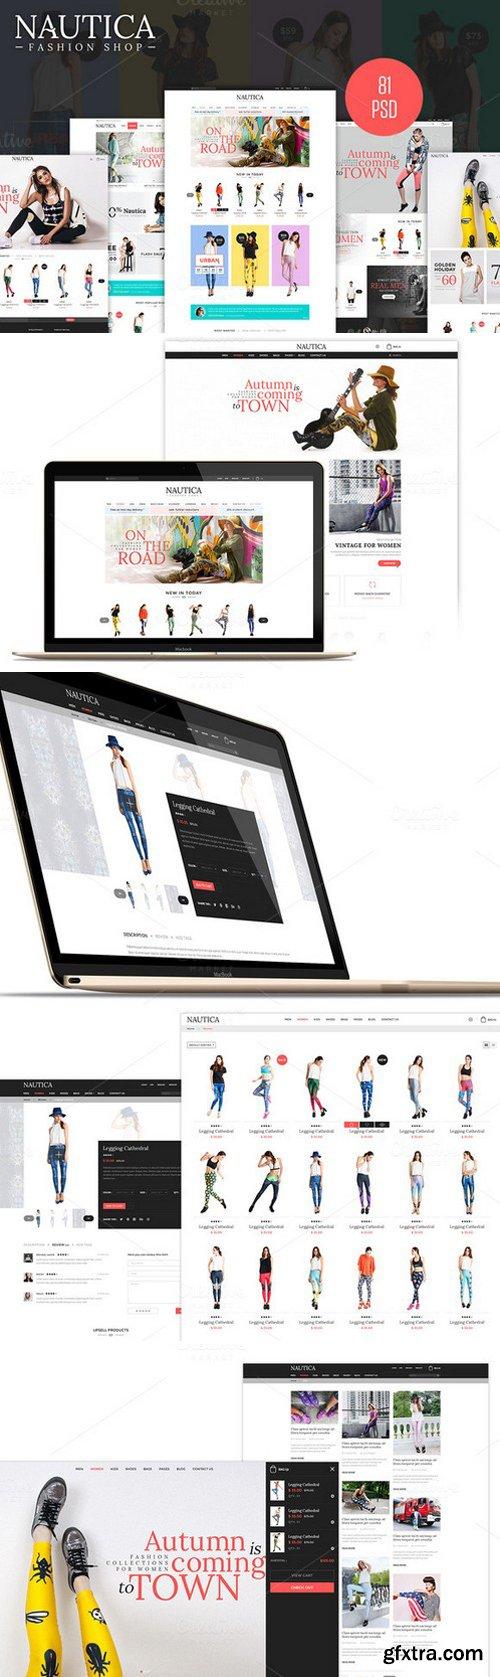 CM - Nautica - Fashion eCommerce PSD 441734